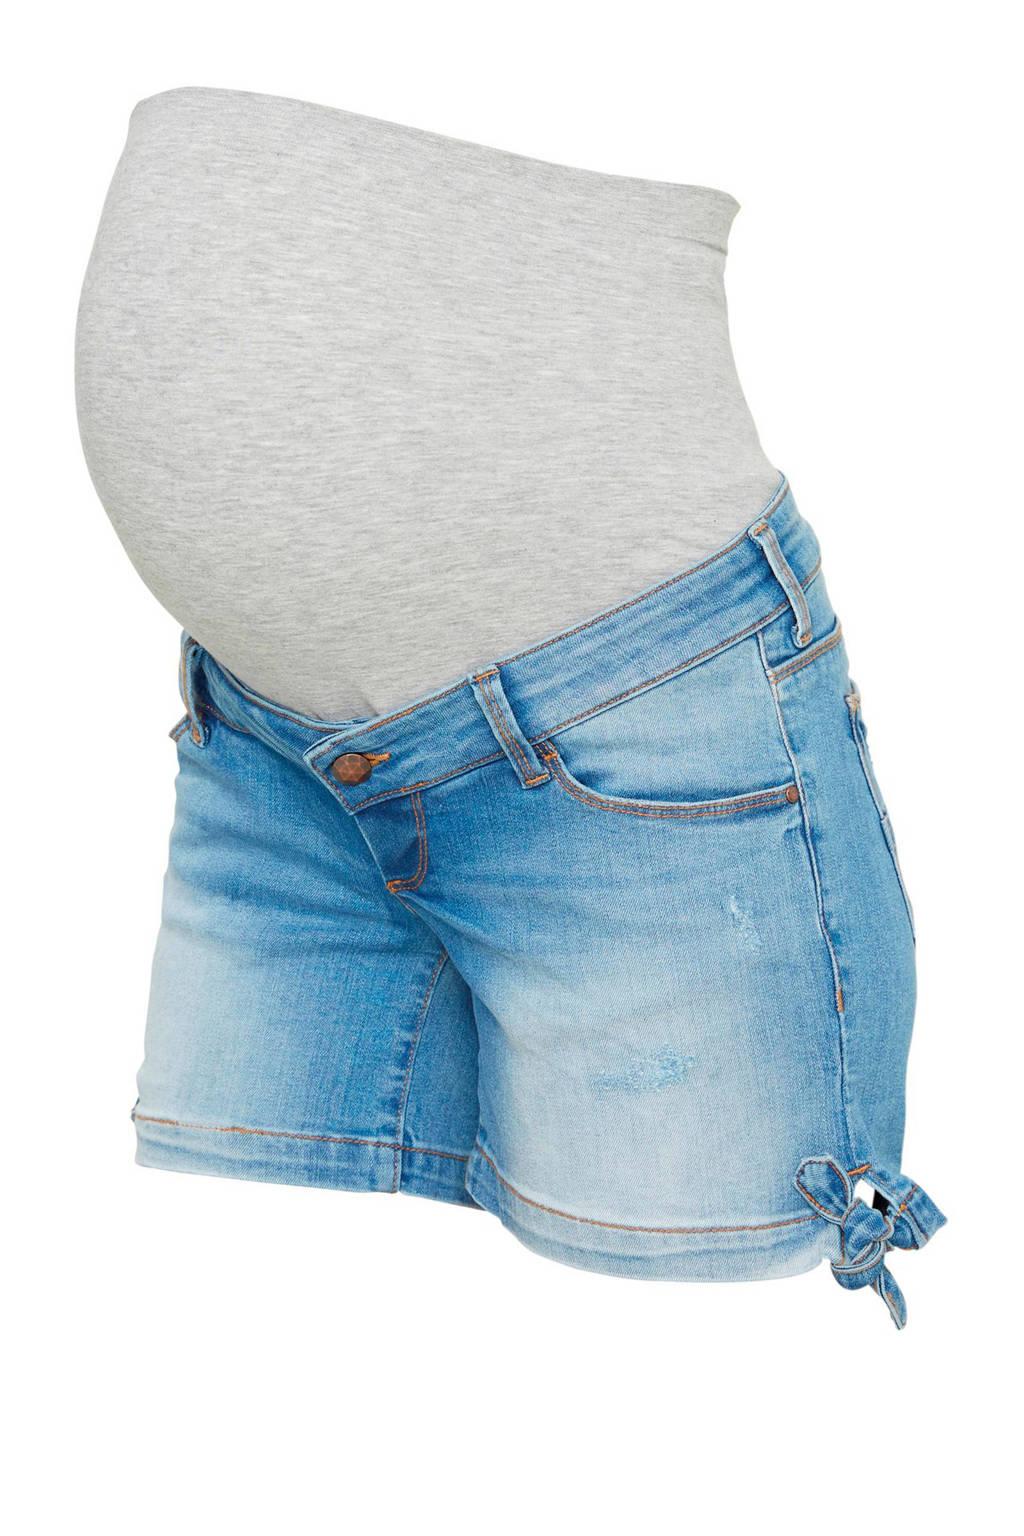 MAMA-LICIOUS zwangerschaps jeans short Cadiz, Light stonewashed